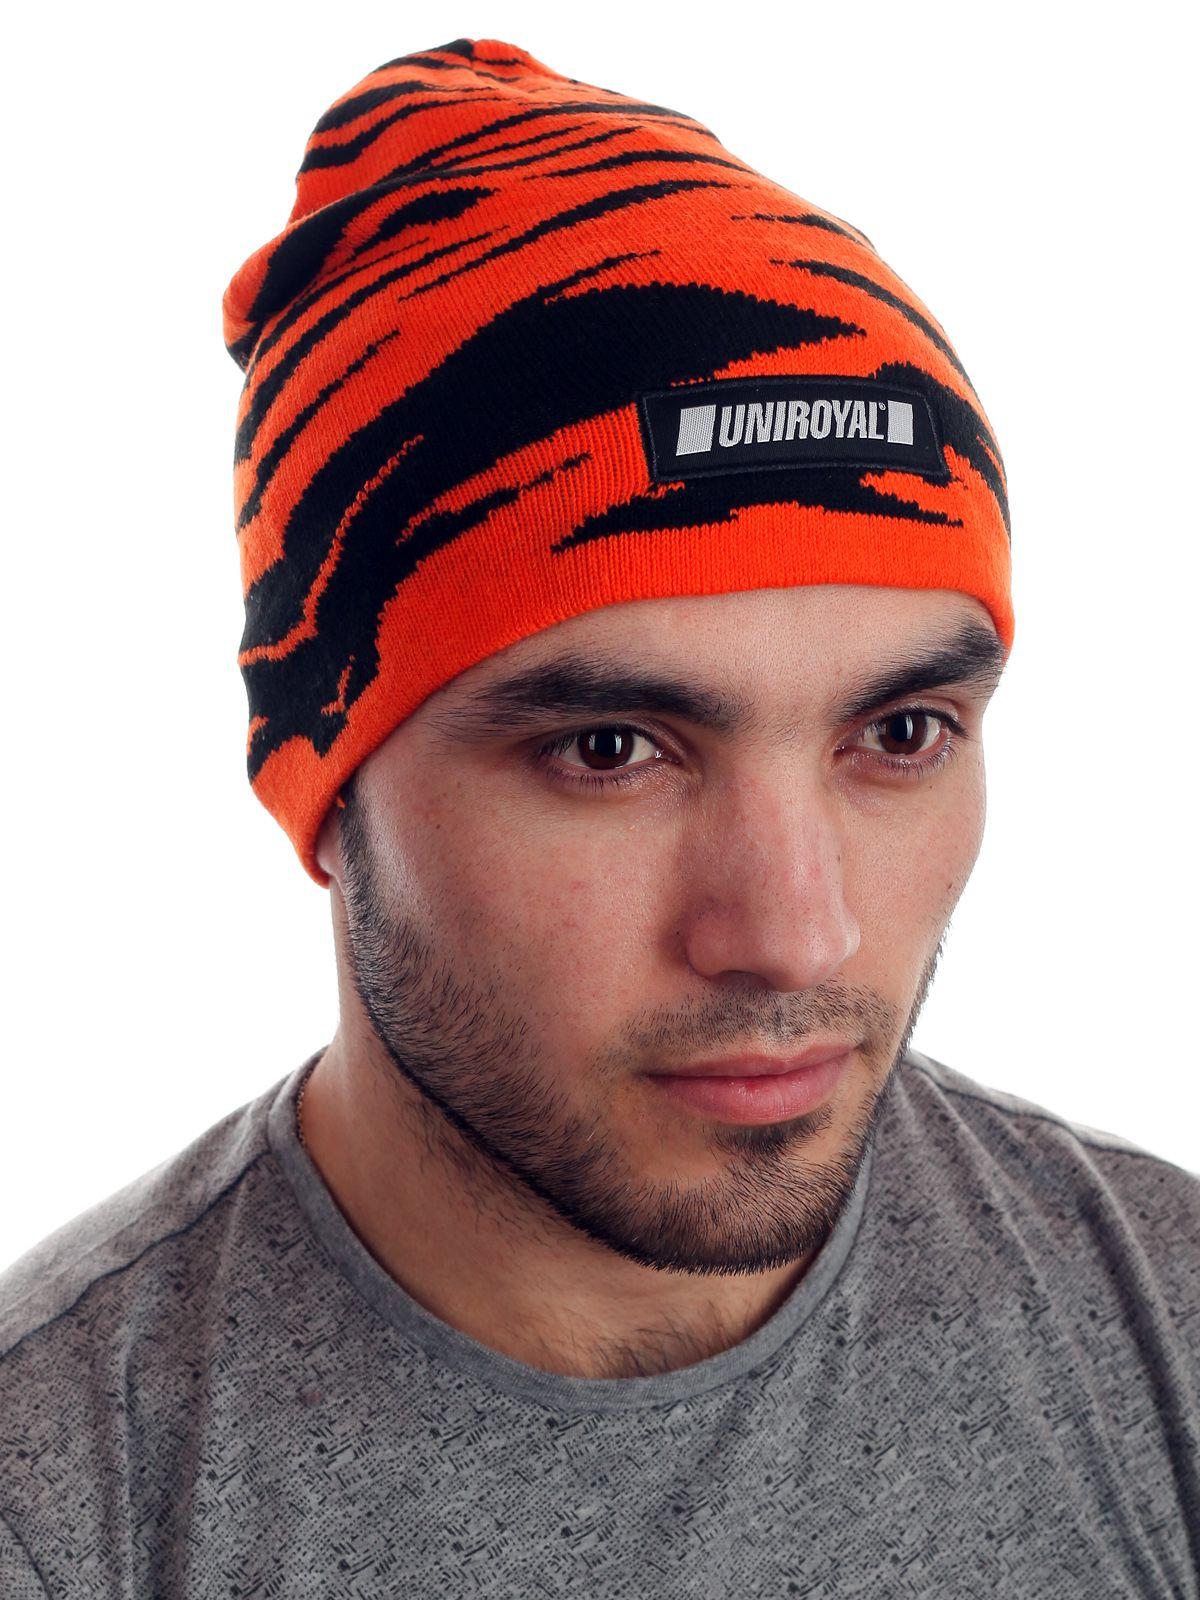 Яркая мужская шапочка с логотипом UNIROYAL